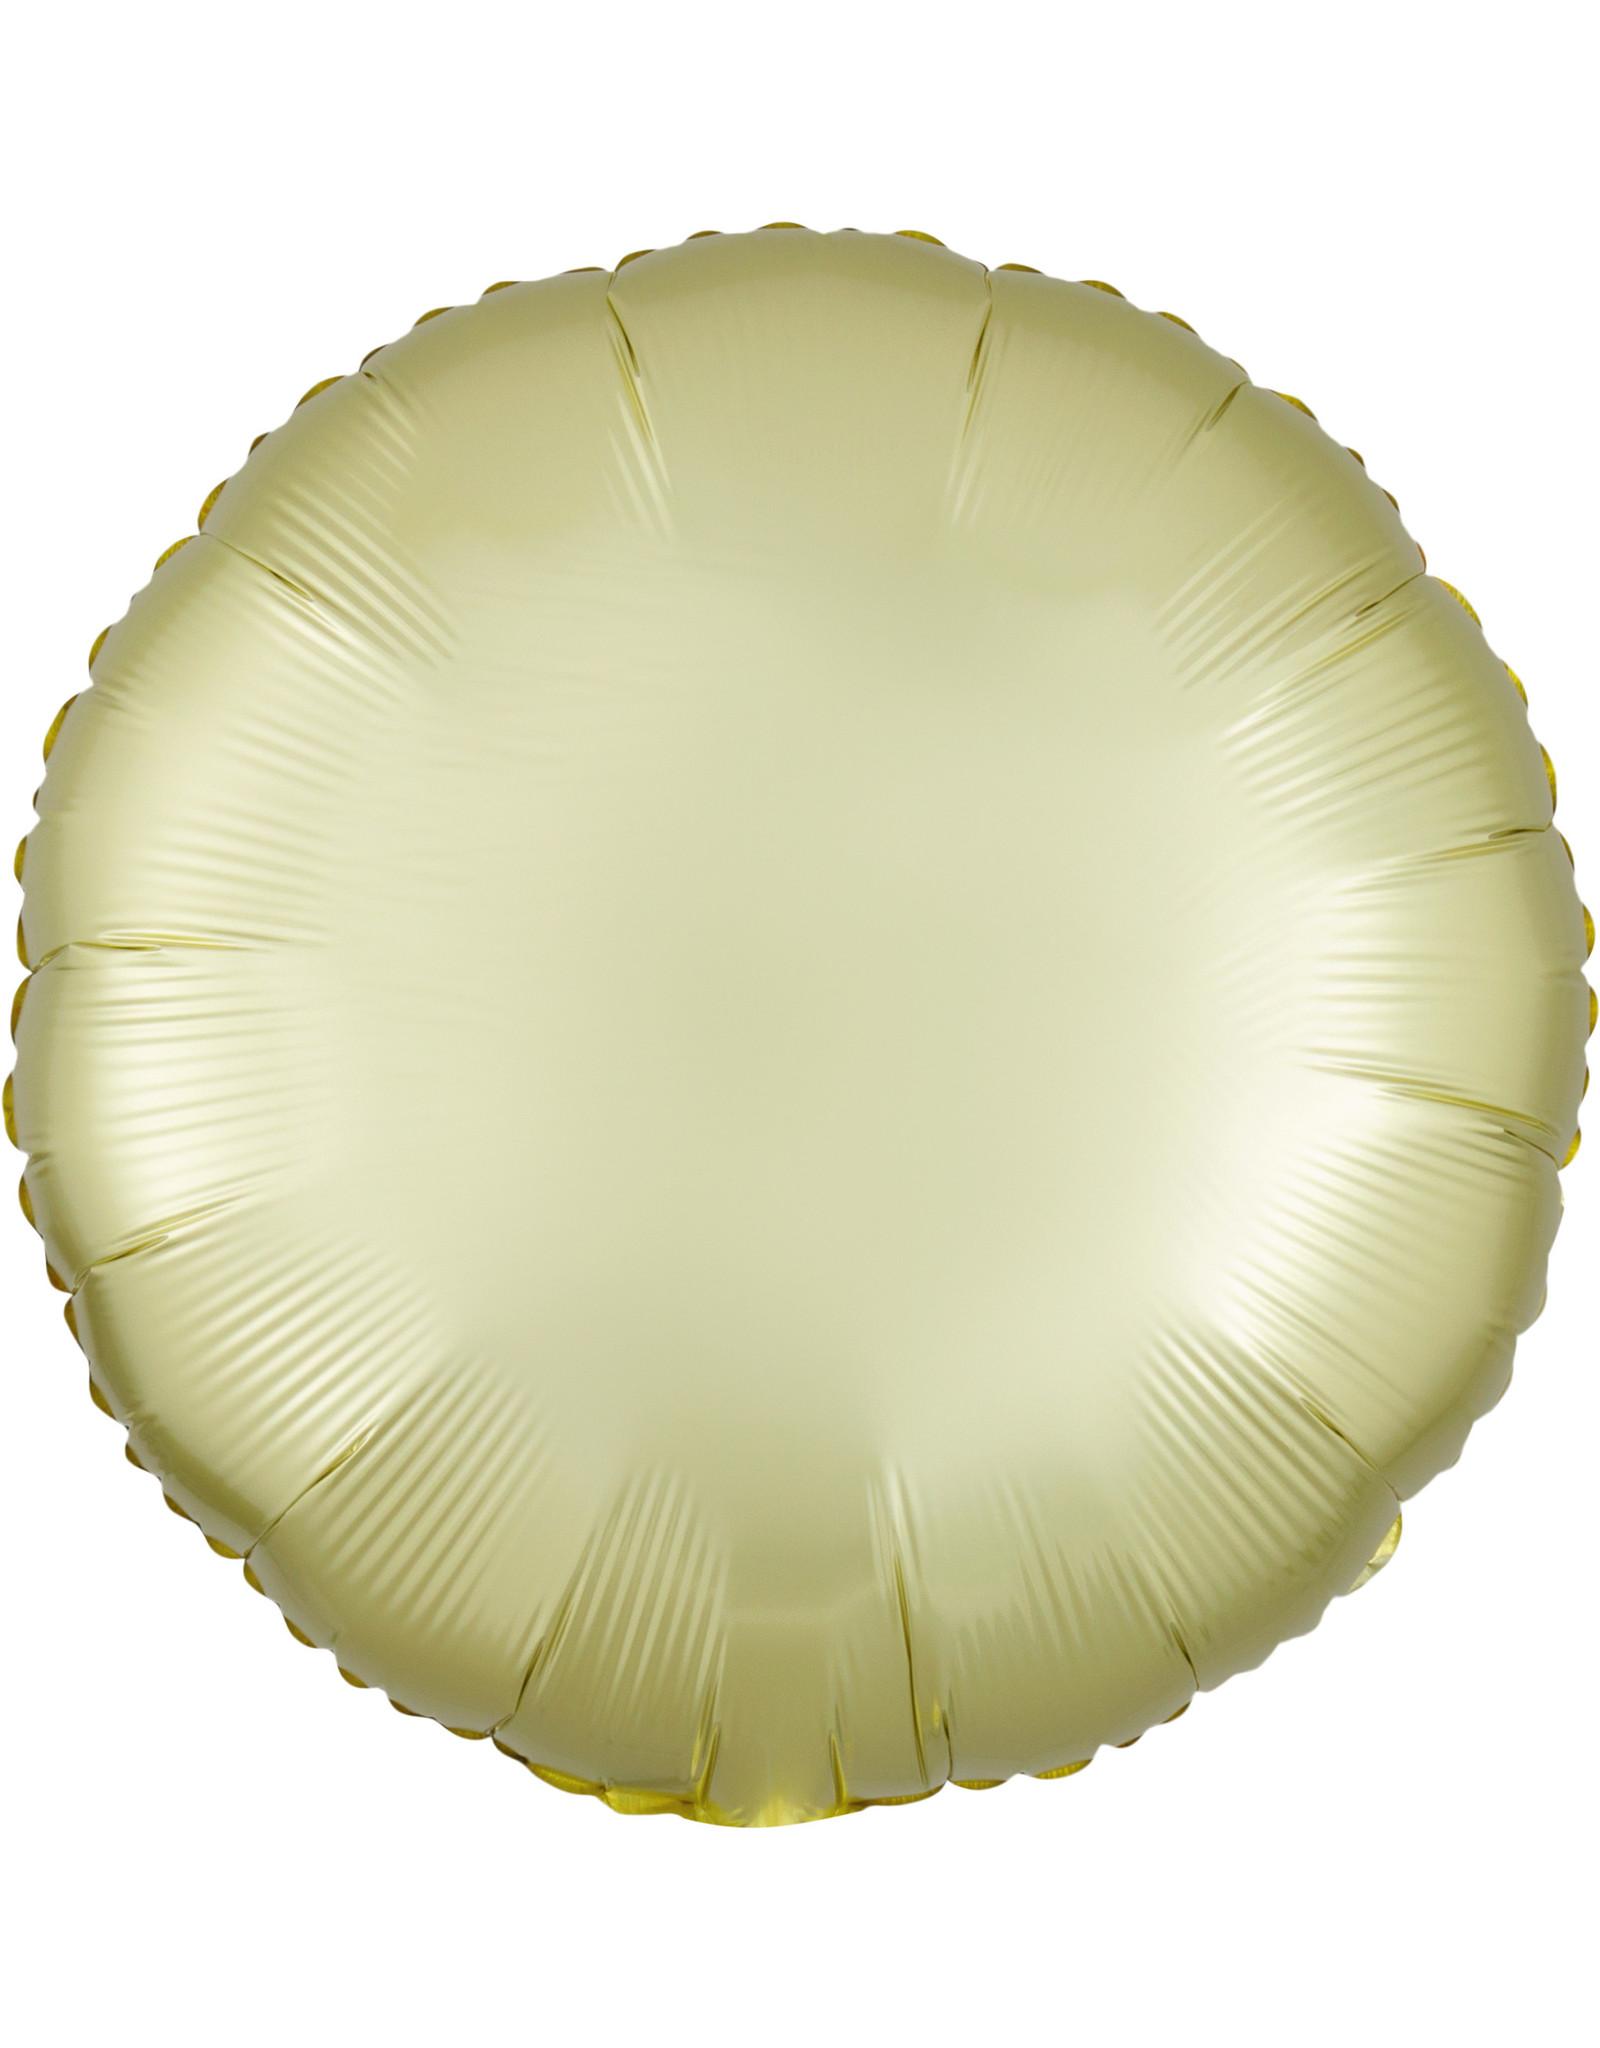 Amscan folieballon pastel yellow rond 43 cm